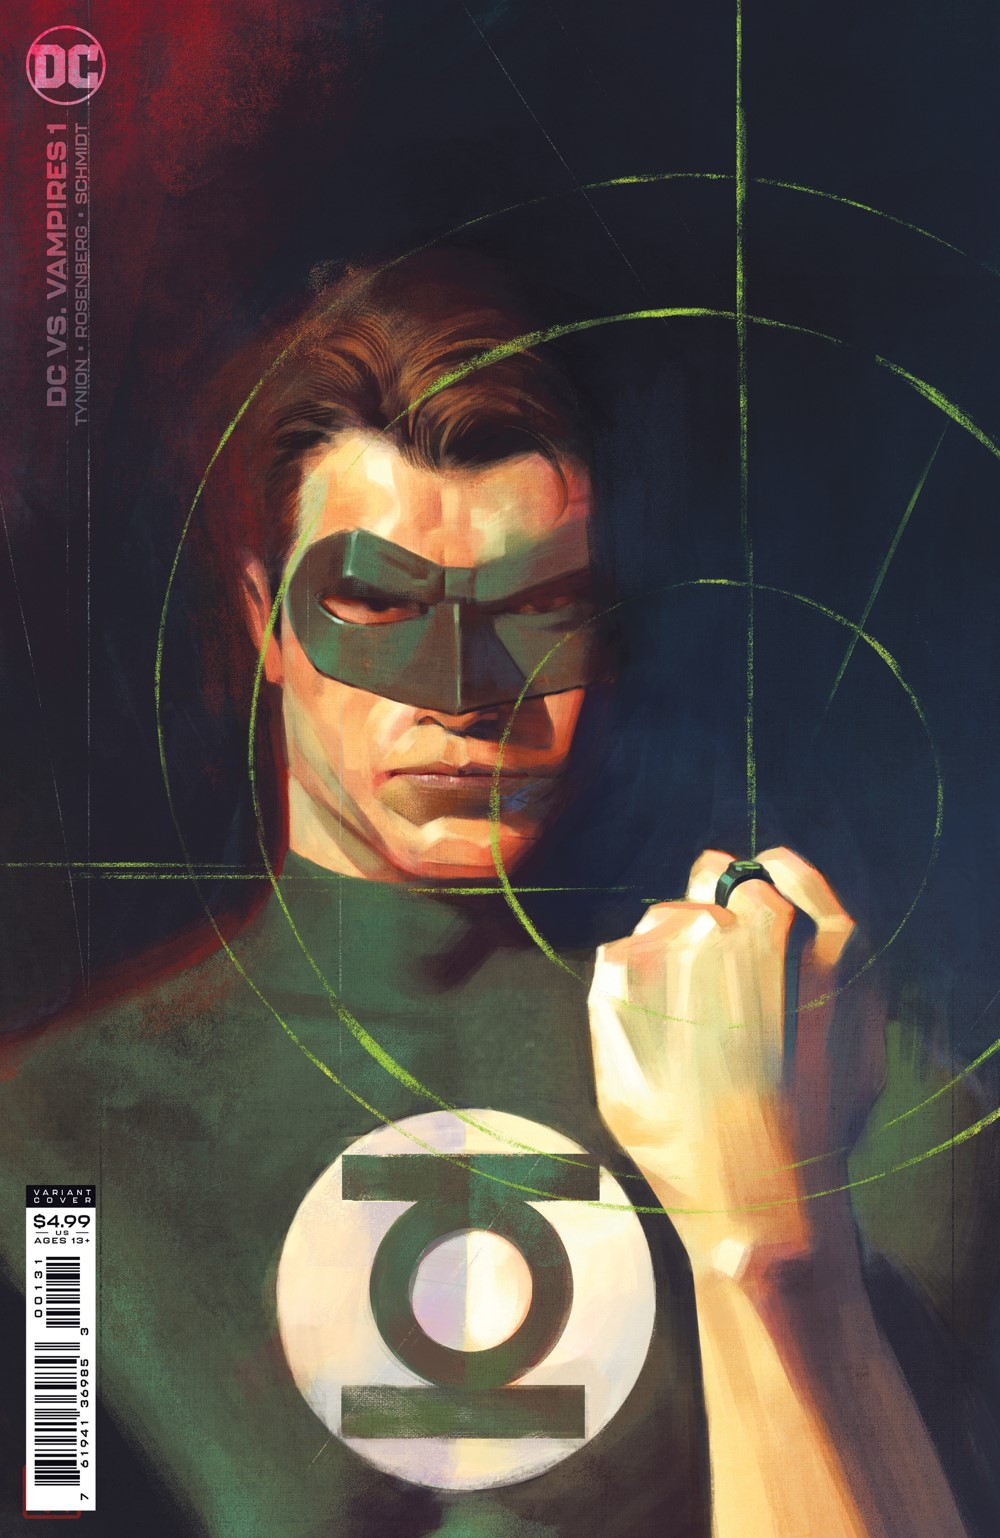 DCvV_Cv1_GLOWINTHEDARK_var_00131 DC Comics October 2021 Solicitations